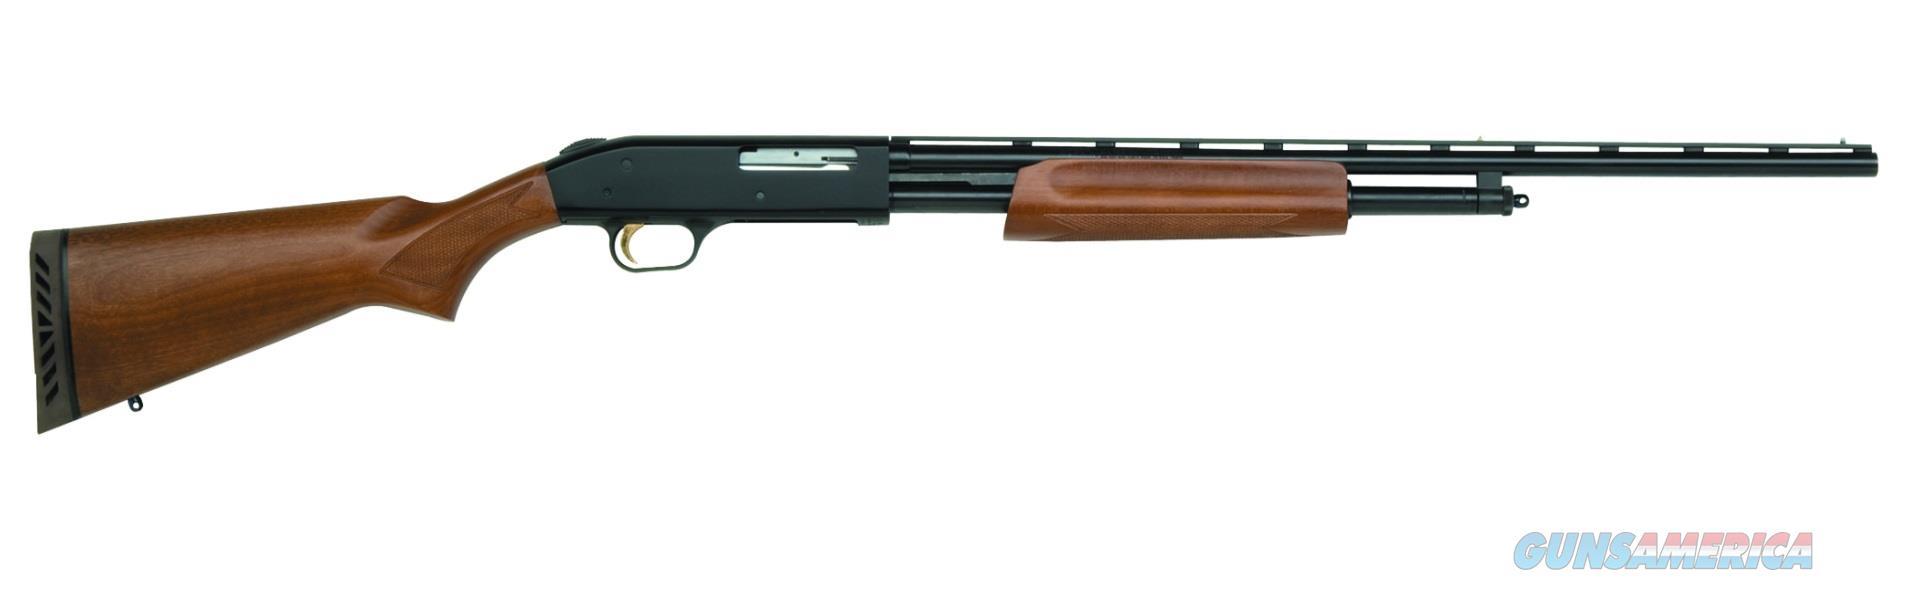 "Mossberg 50104 500 All Purpose Field Pump 410 Gauge 24"" 3"" Walnut Stk Blued  Guns > Shotguns > Mossberg Shotguns > Pump > Sporting"